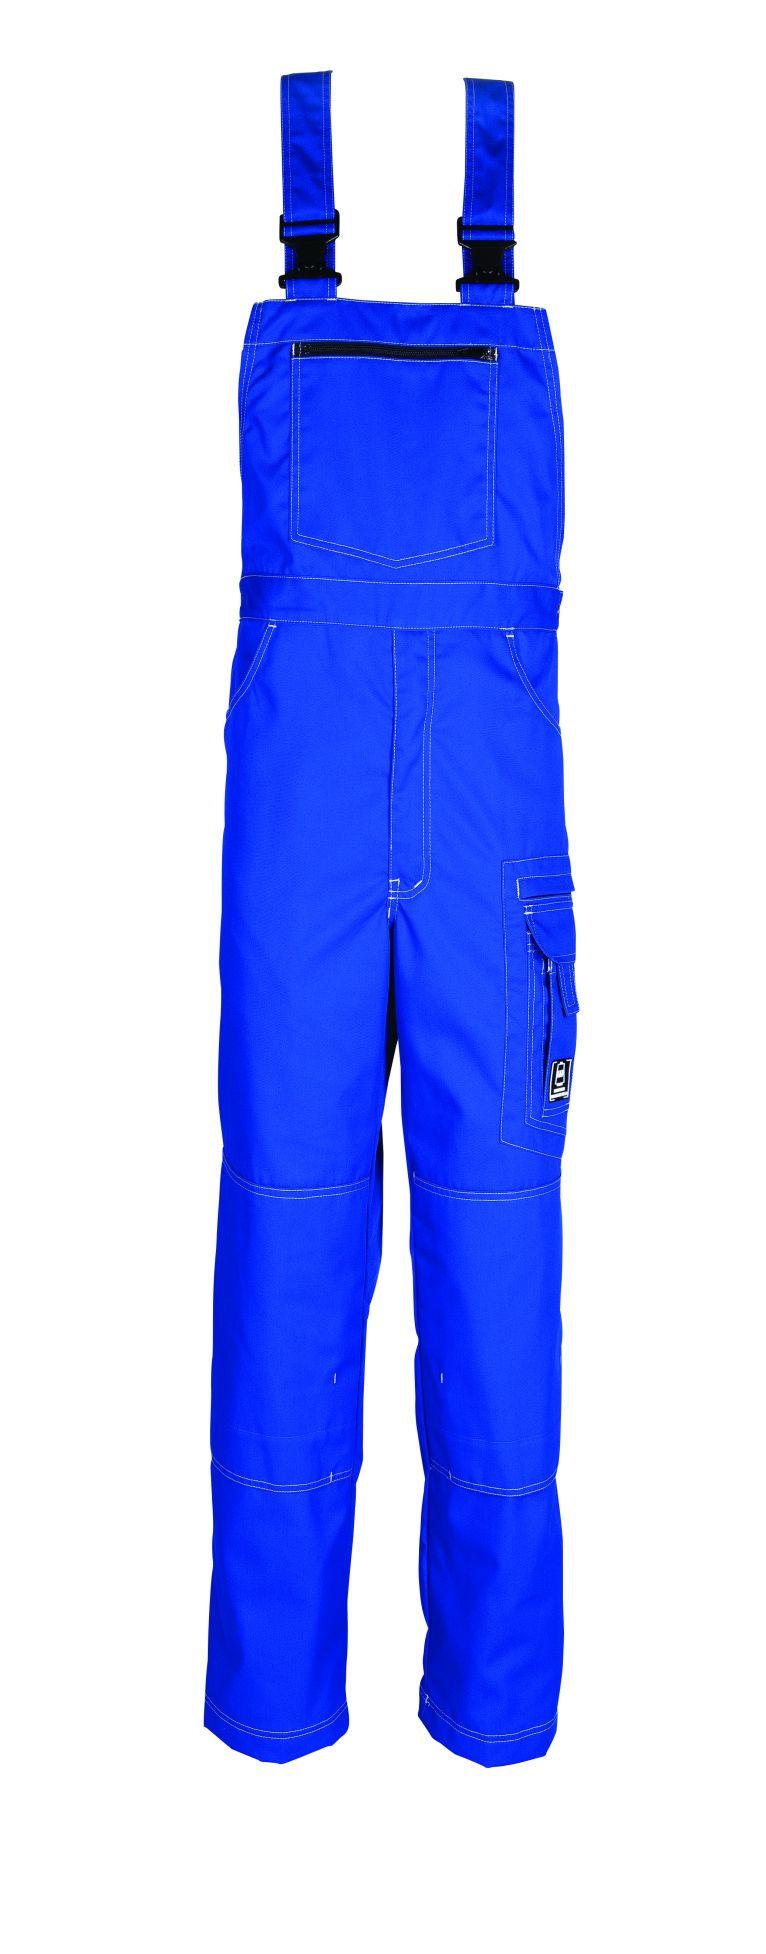 HaVeP Workwear/Protective wear Amerikaanse overall/Bretelbroek 20102